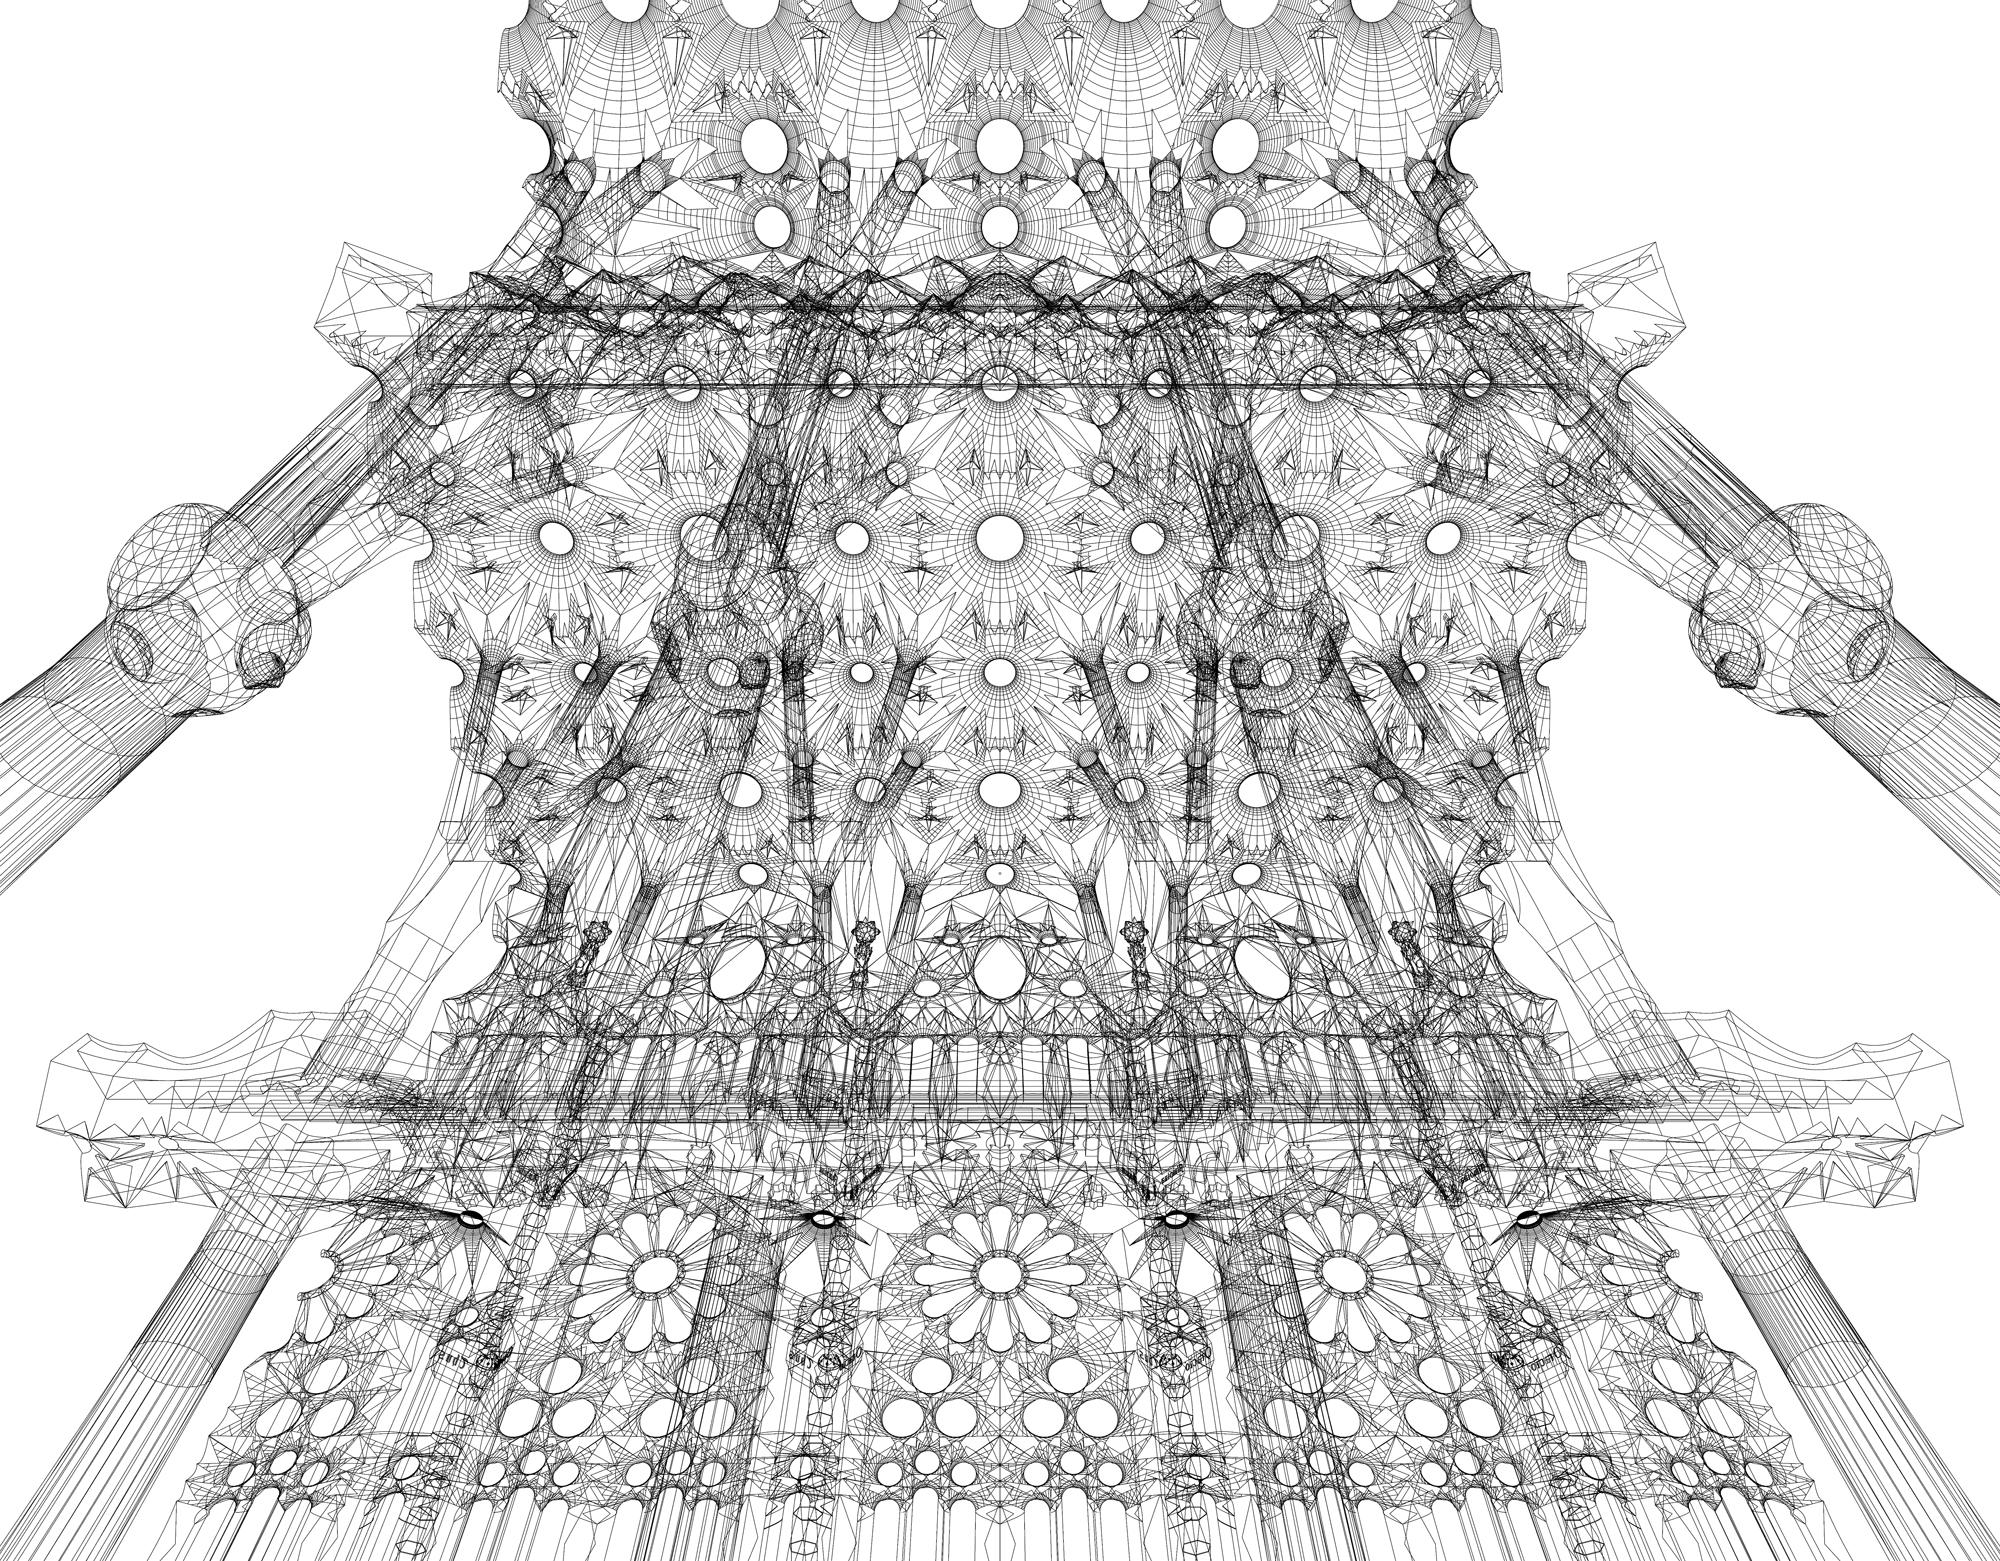 Line Drawing Using C : Sagrada familia cerebrovortex